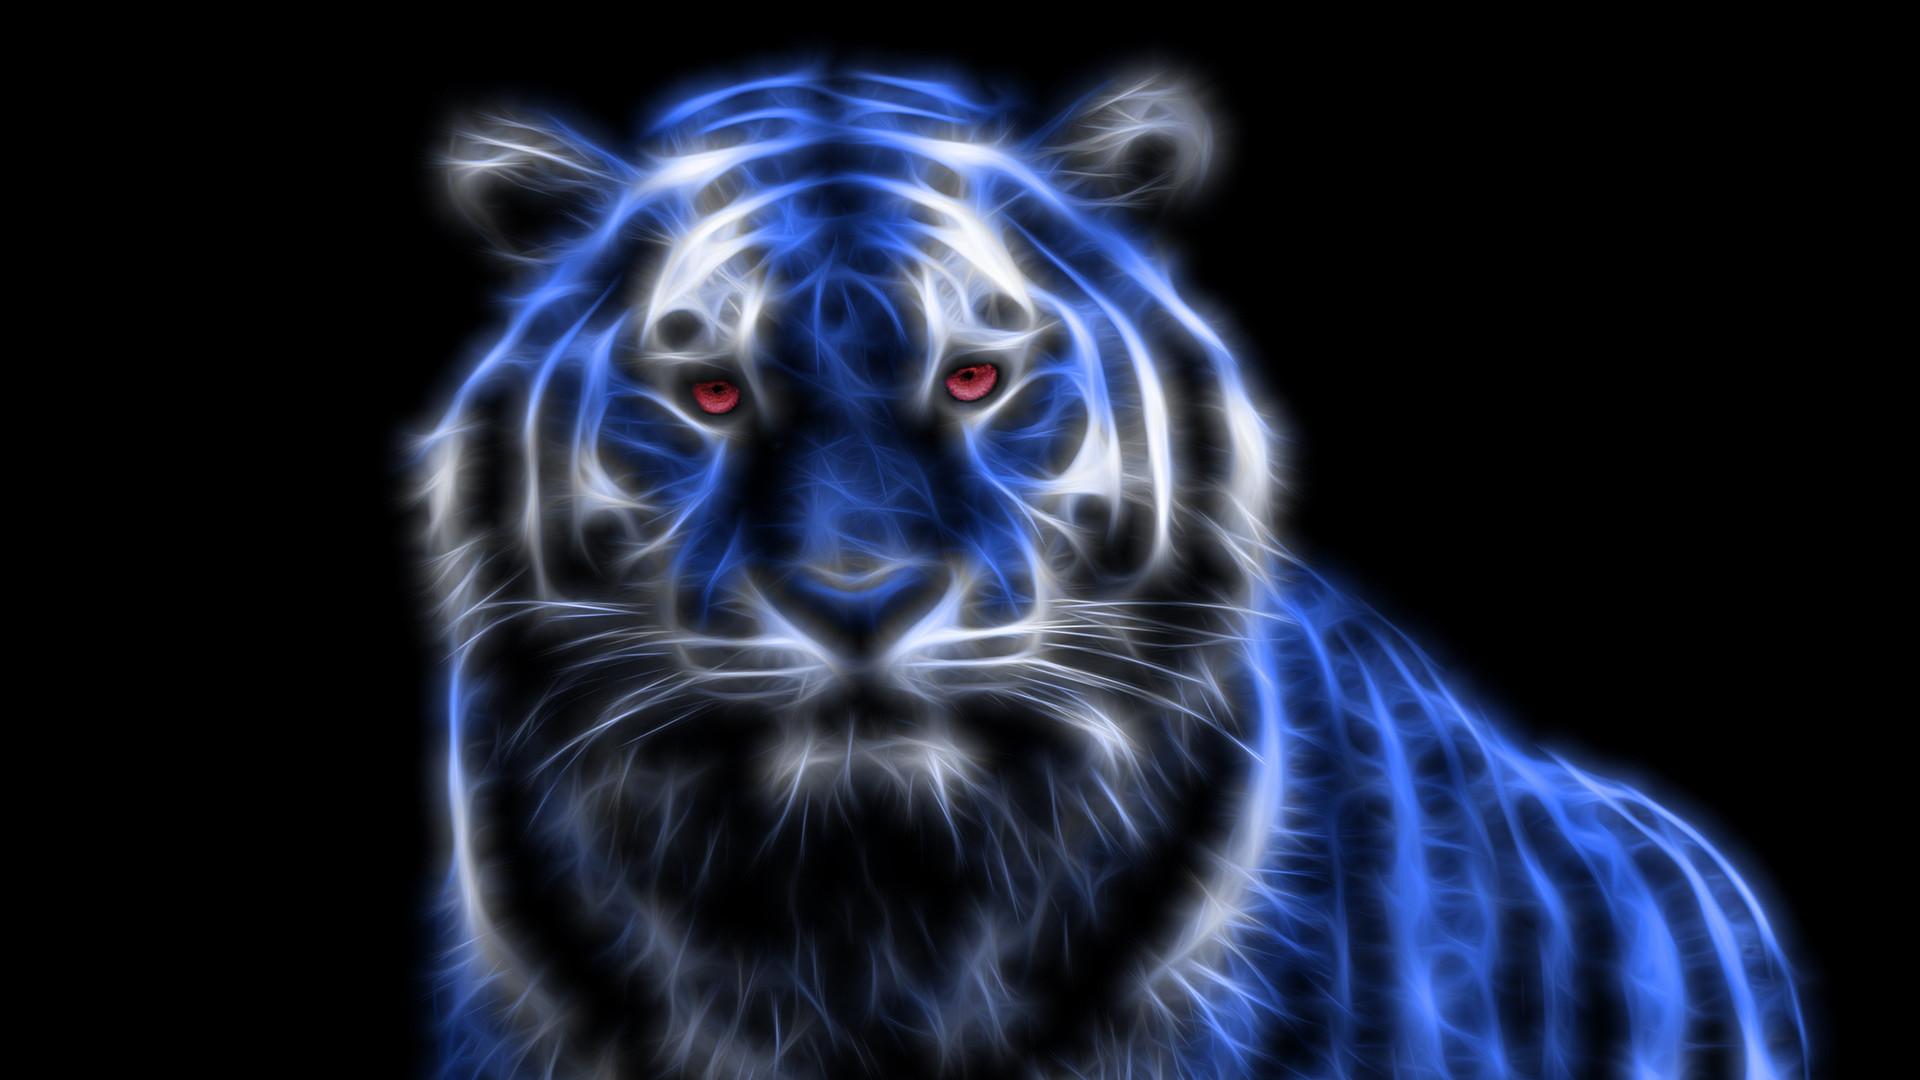 Neon tiger Wallpaper #30888